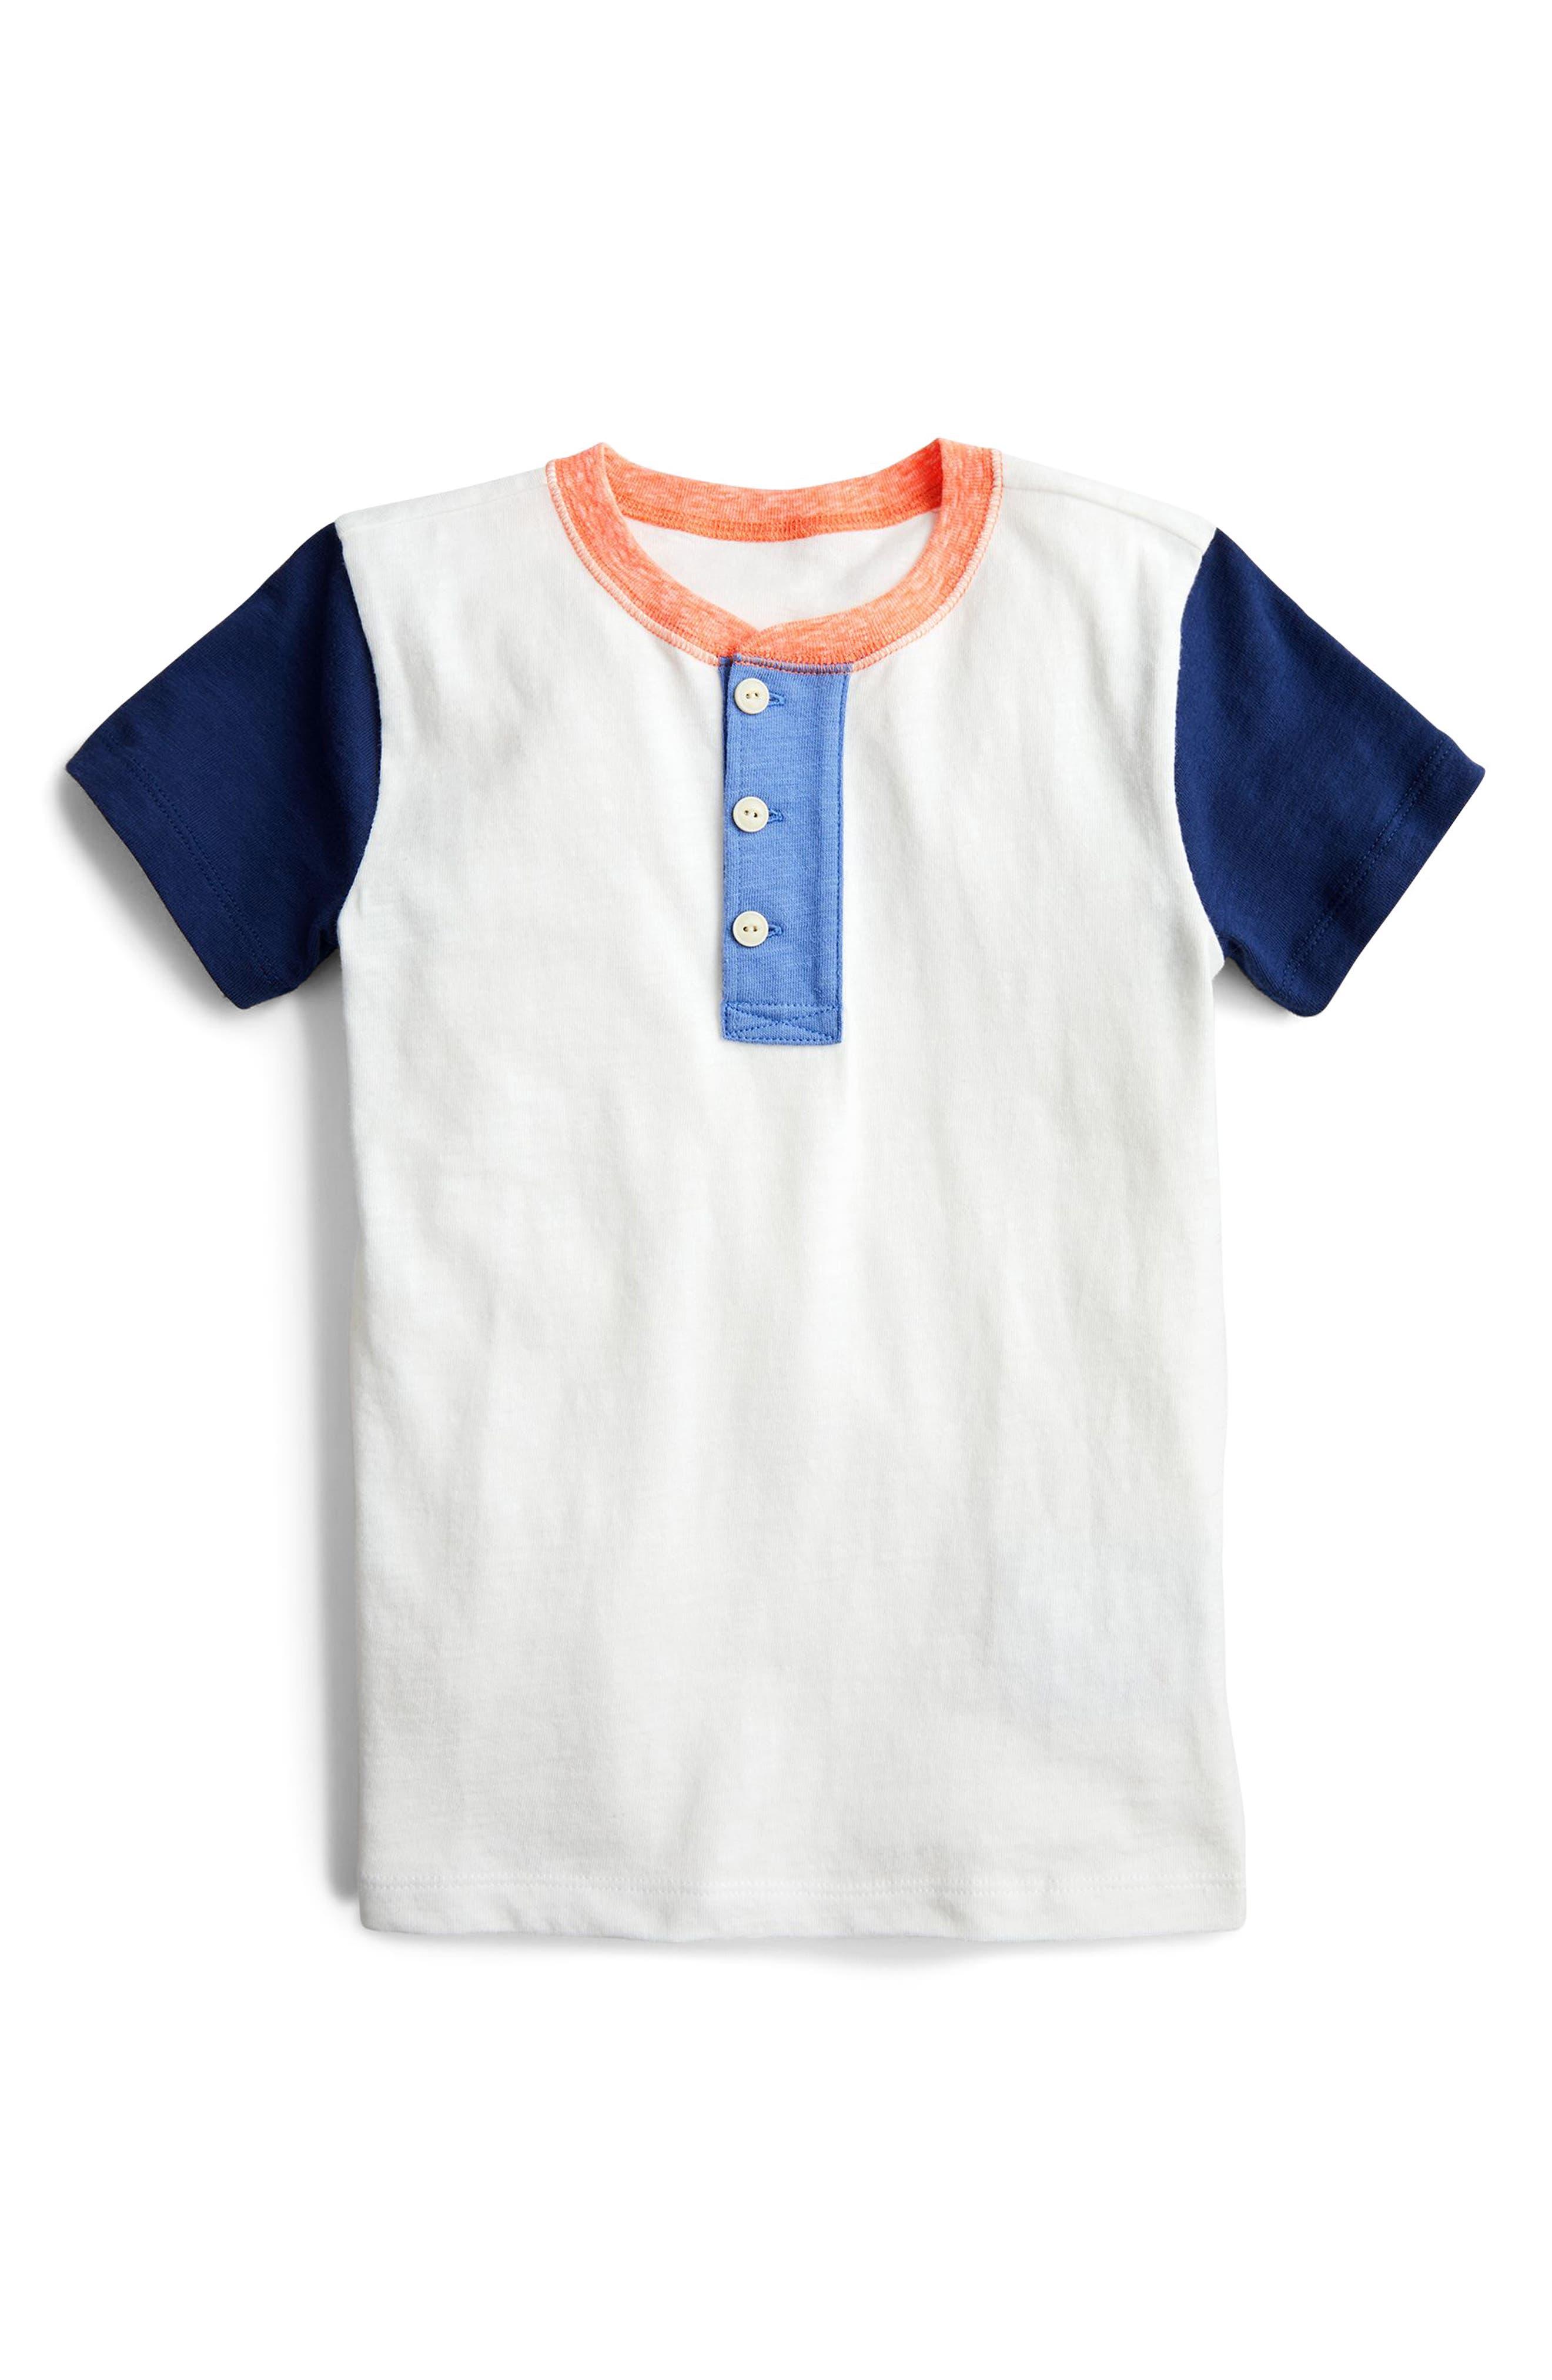 Colorblock Henley Shirt,                             Main thumbnail 1, color,                             900